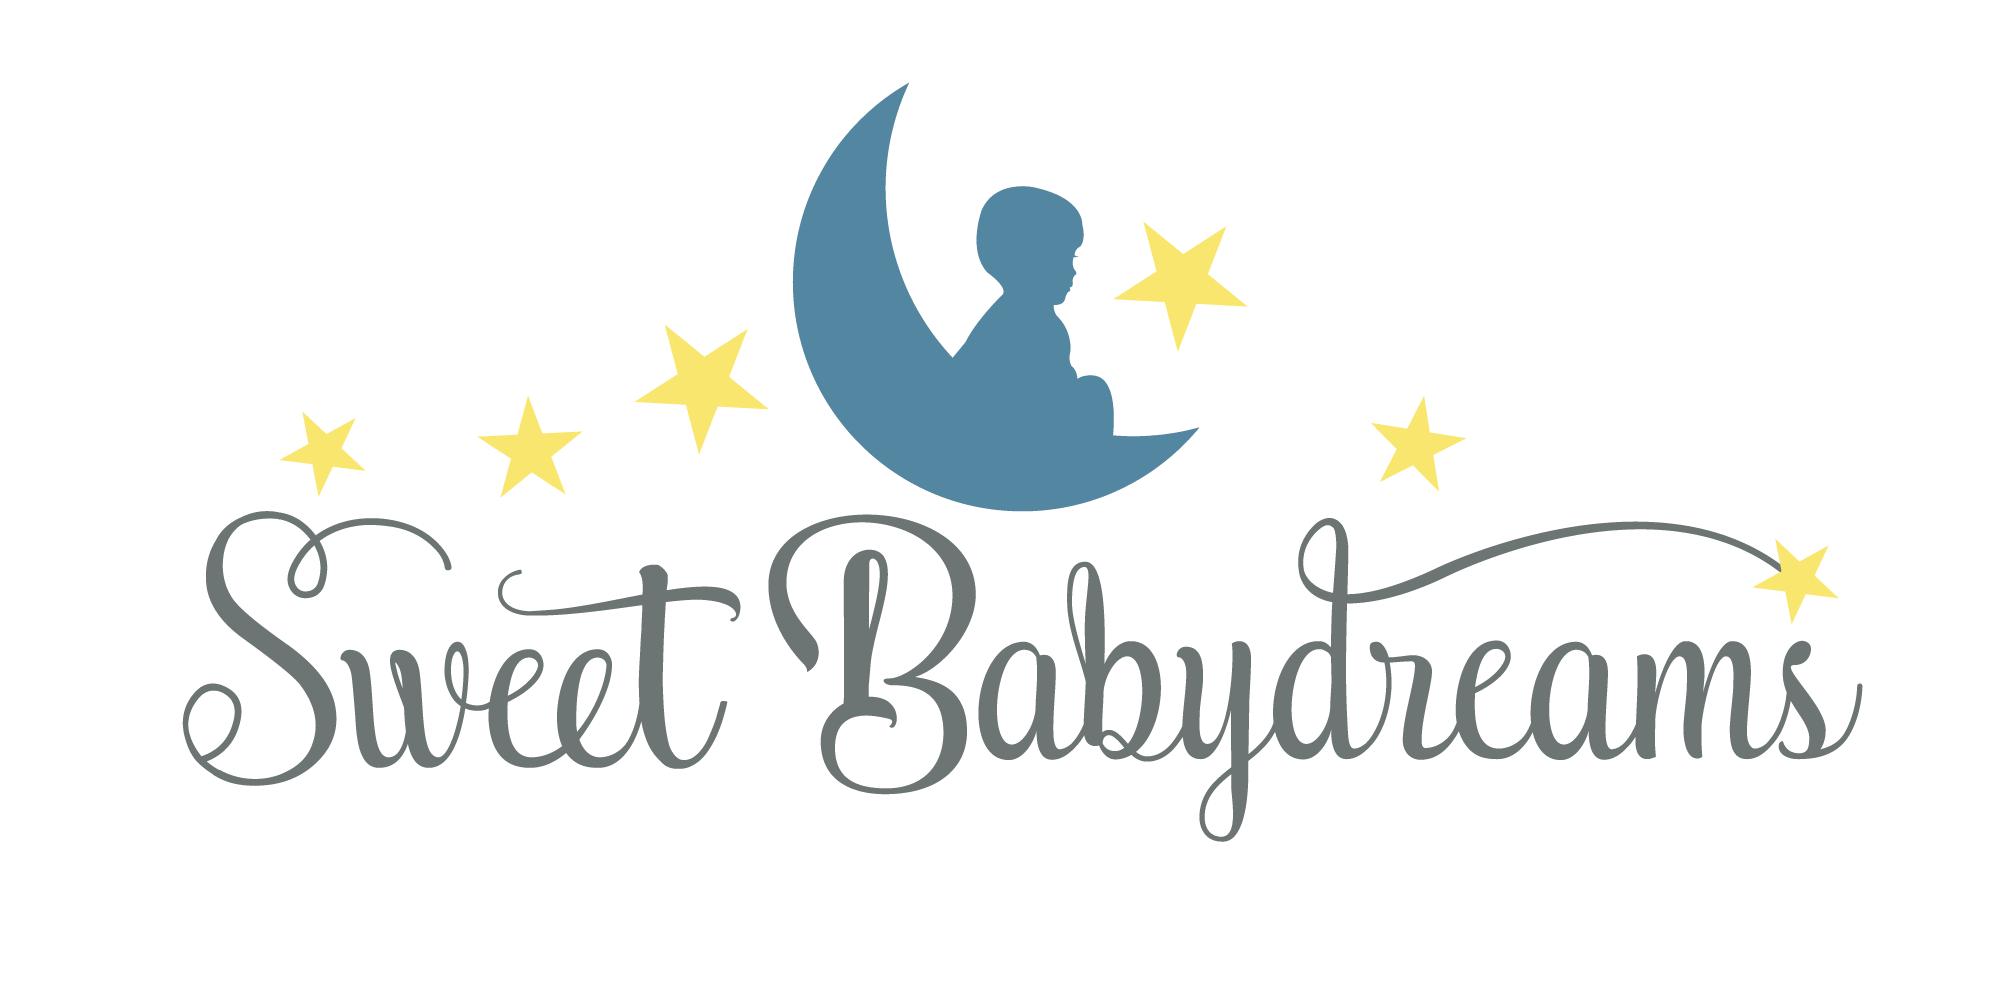 Sweet Babydreams